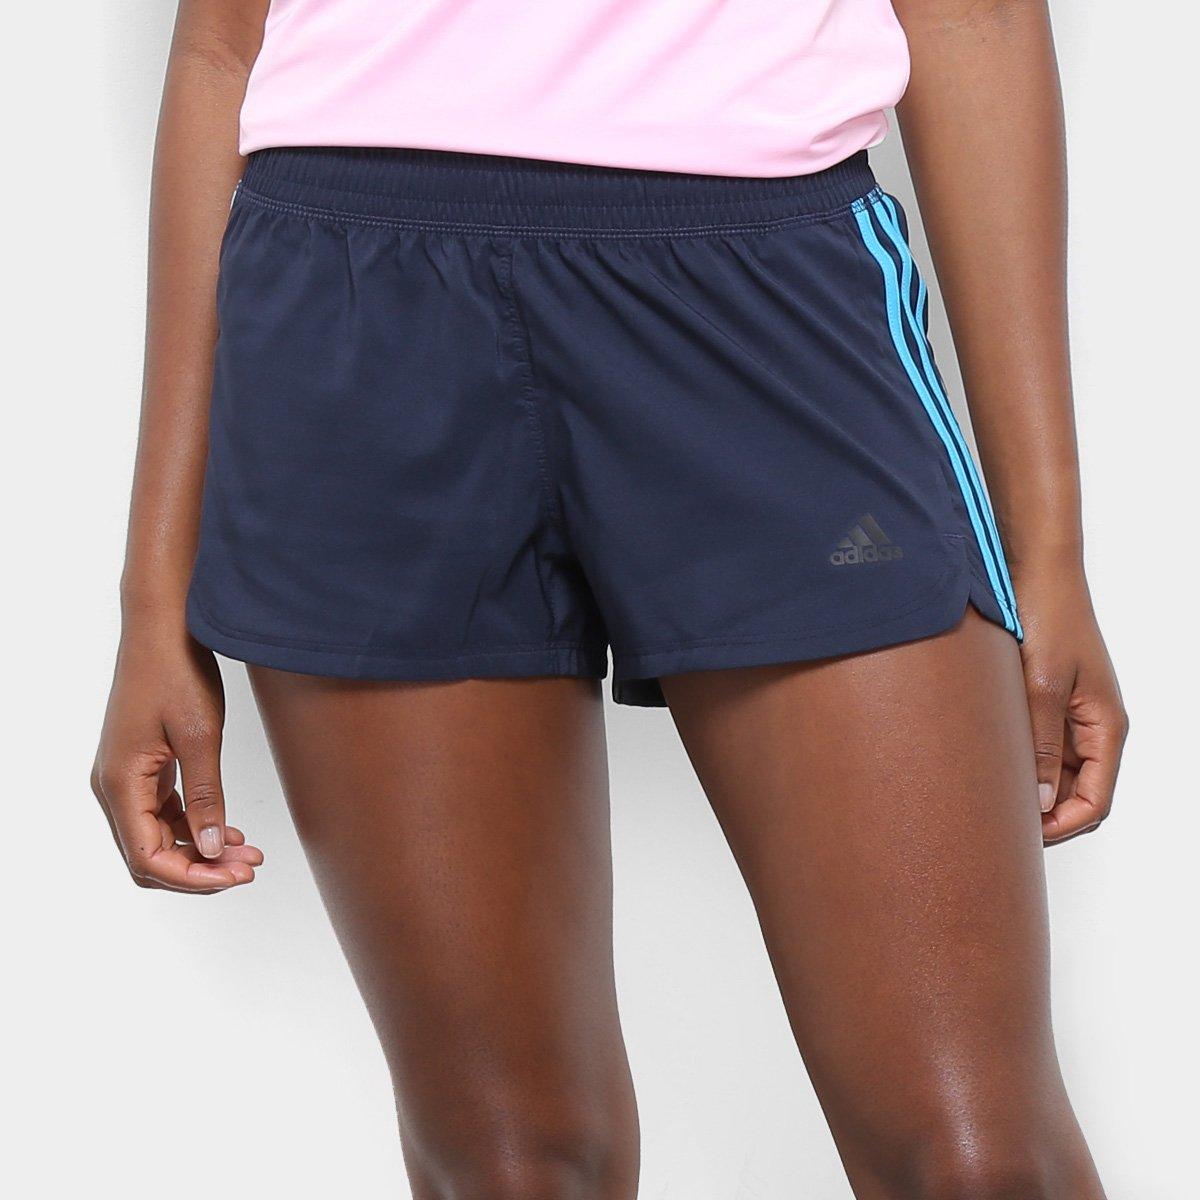 6a2689580b557 FornecedorNetshoes. Short Adidas Pacer 3 Stripes Feminino